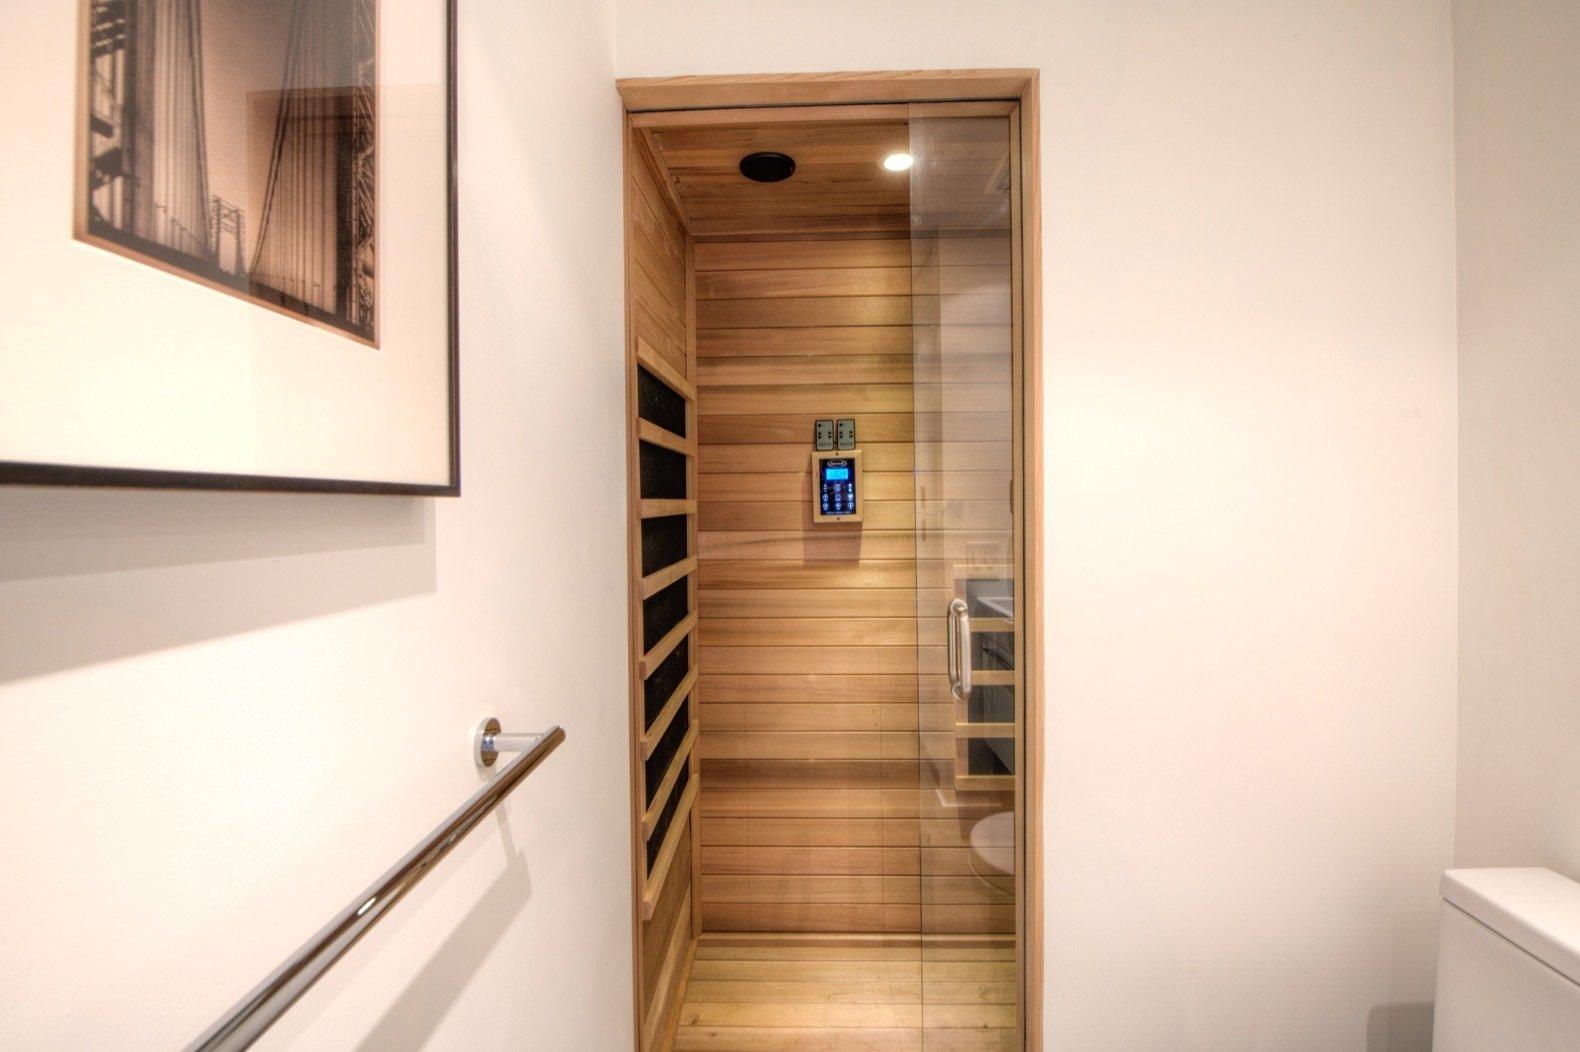 Gavin Newsom midcentury home sauna